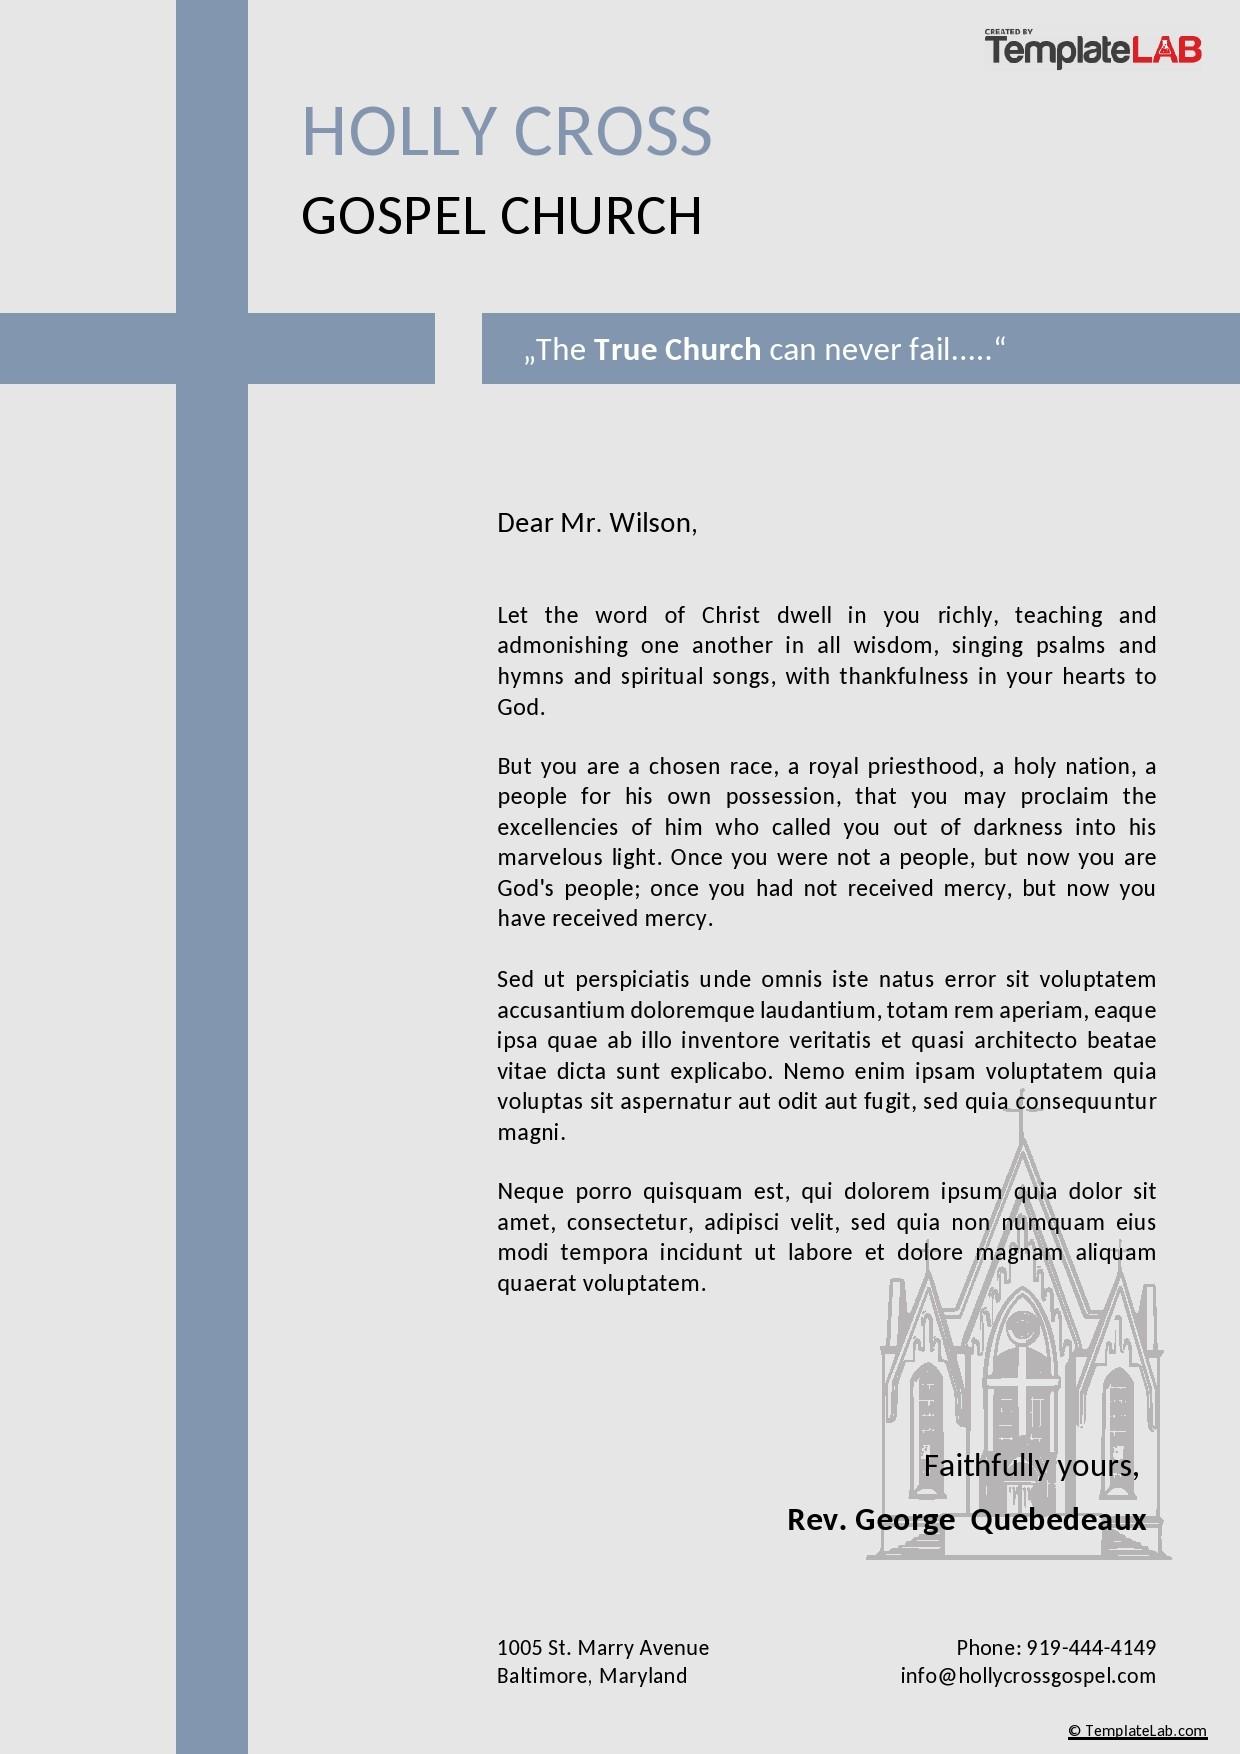 Free Church Letterhead Template - TemplateLab.com